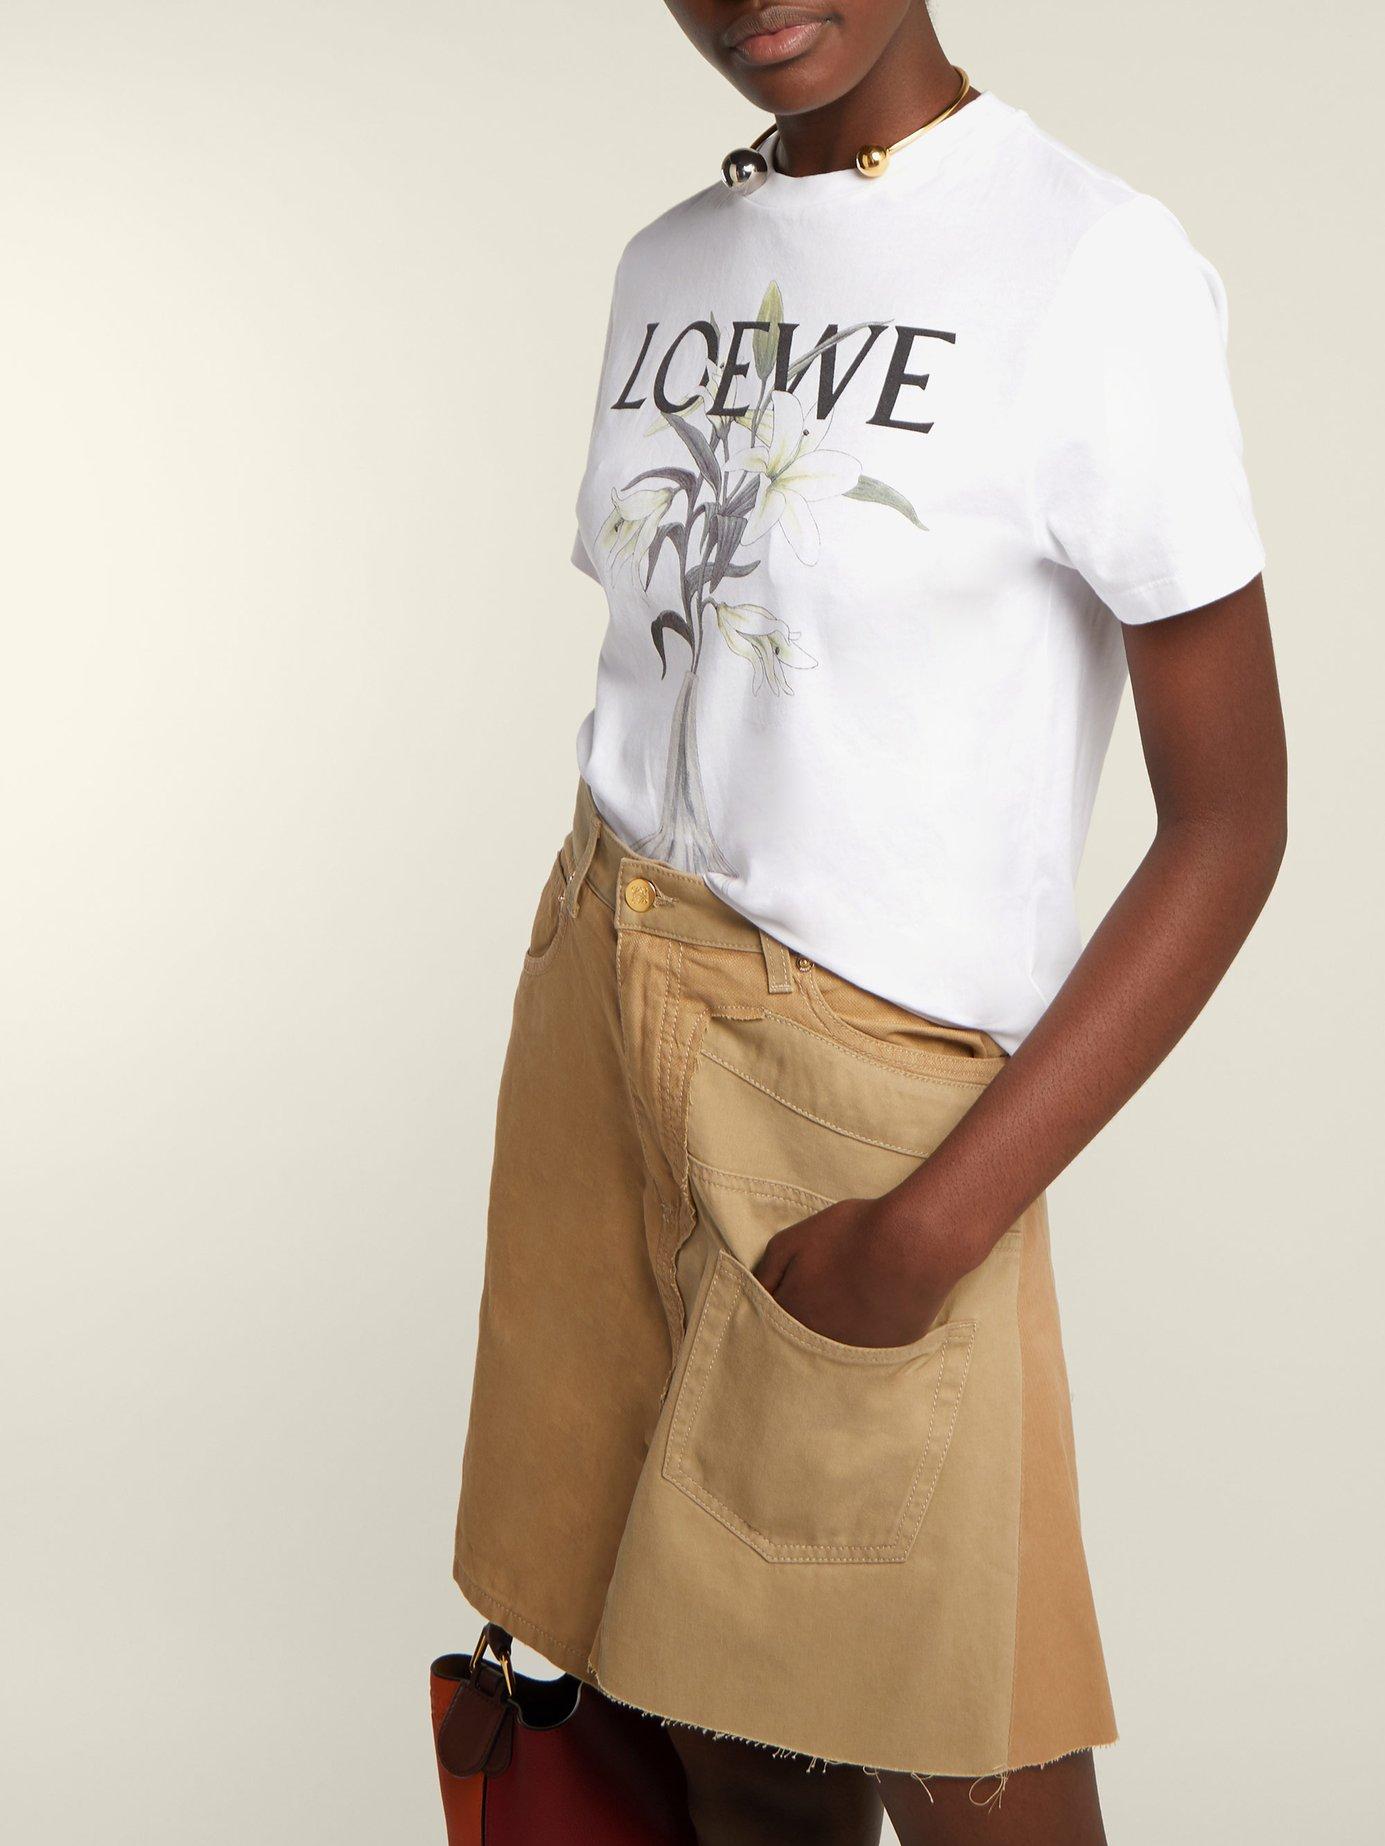 Logo-print cotton-jersey T-shirt by Loewe